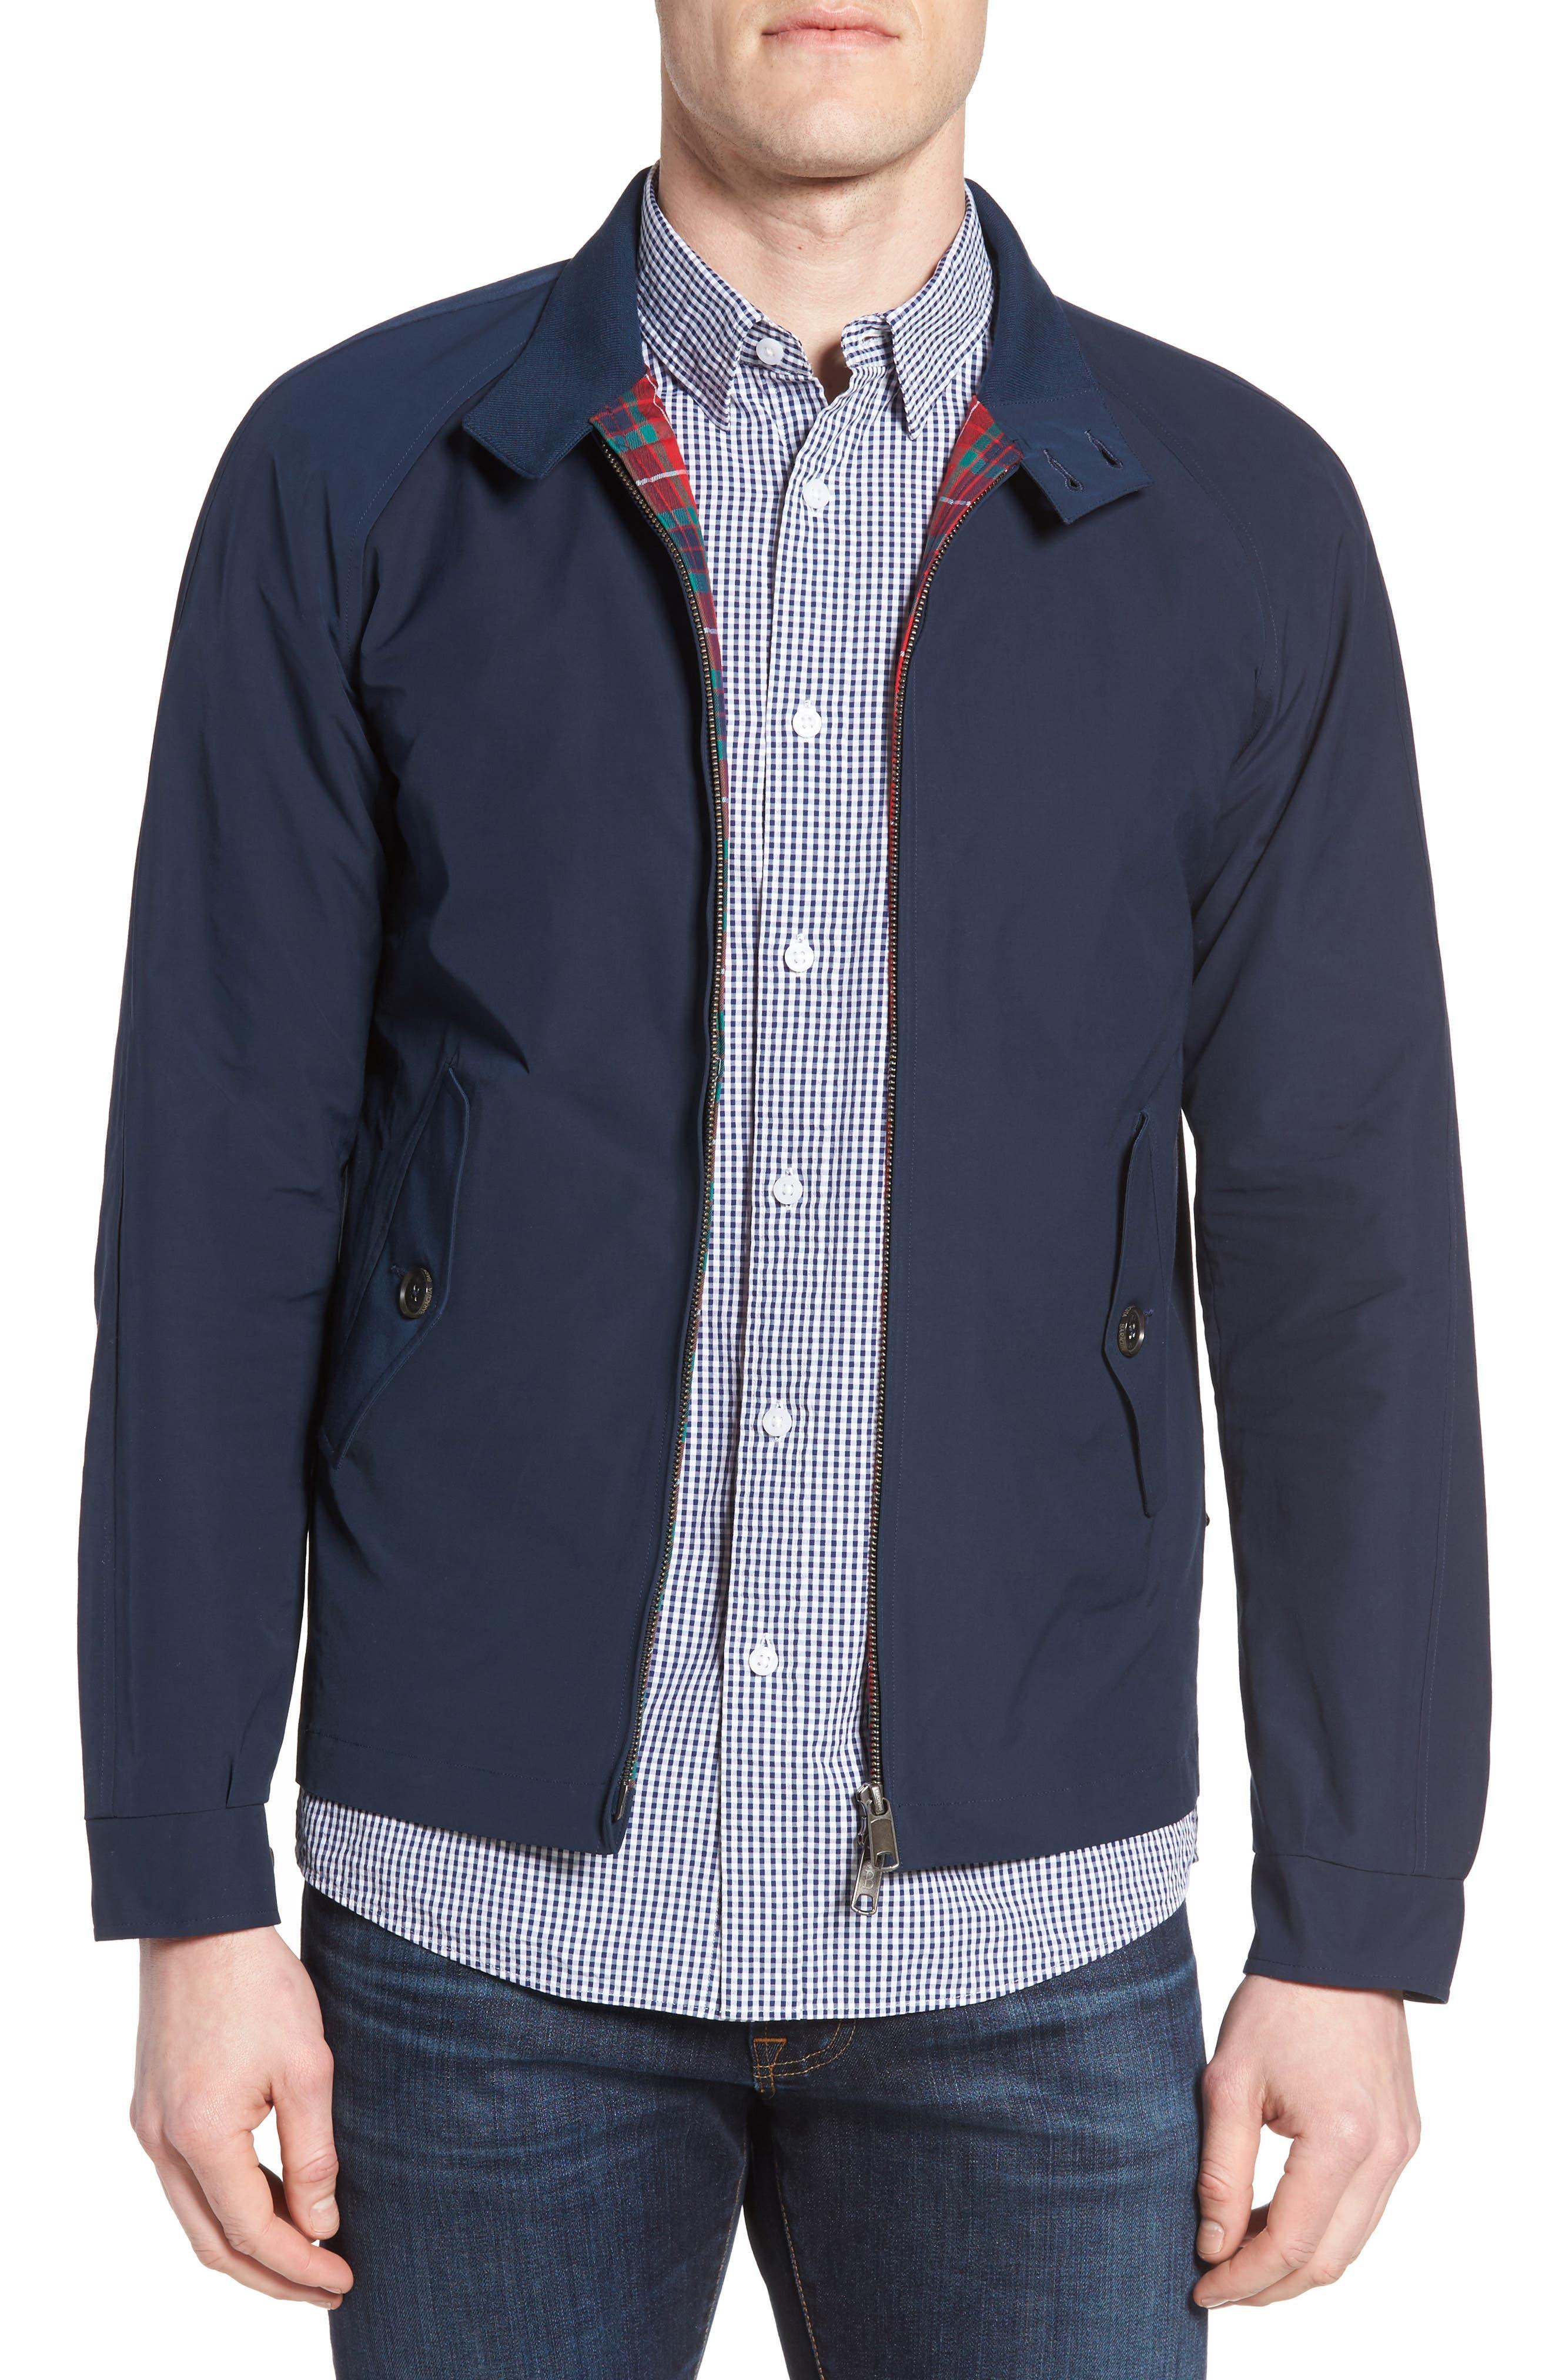 G4 Water Repellent Harrington Jacket,                         Main,                         color, Navy